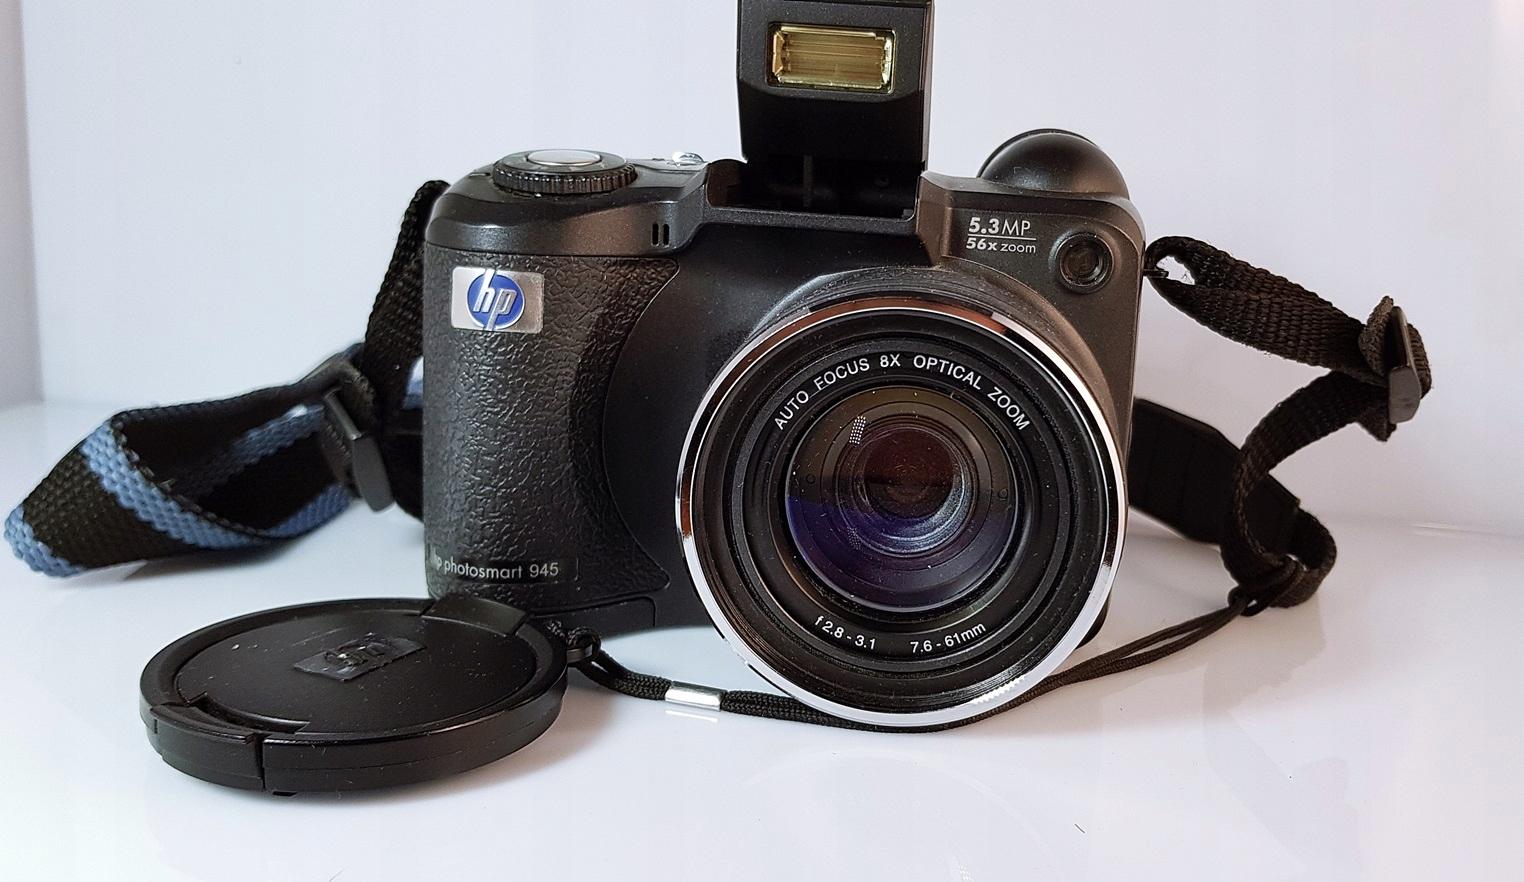 Aparat cyfrowy HP Photosmart 945